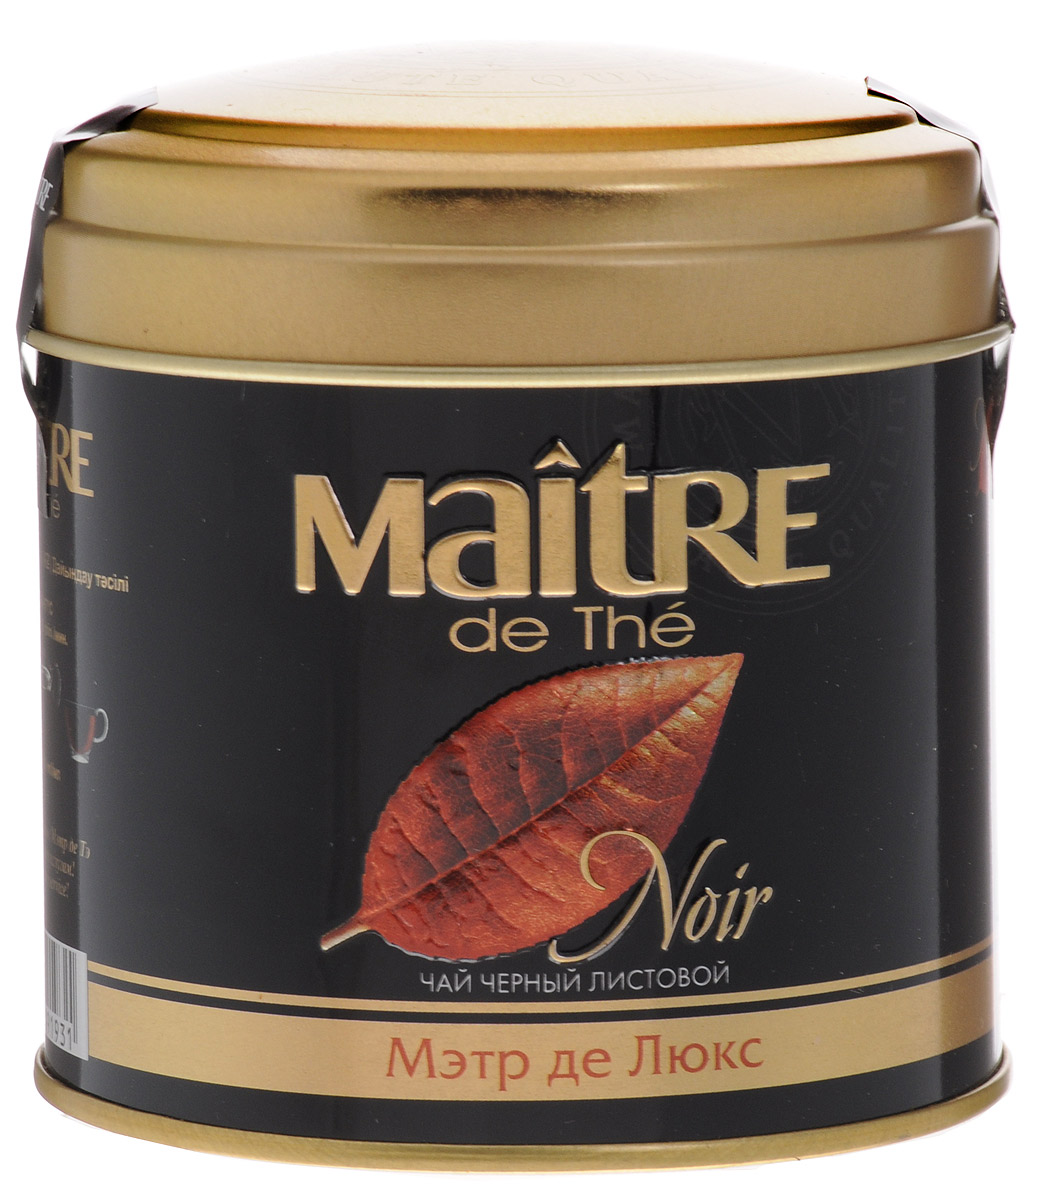 Maitre de The Де Люкс черный листовой чай, 100 г (жестяная банка) maitre de the де люкс зеленый листовой чай 65 г жестяная банка